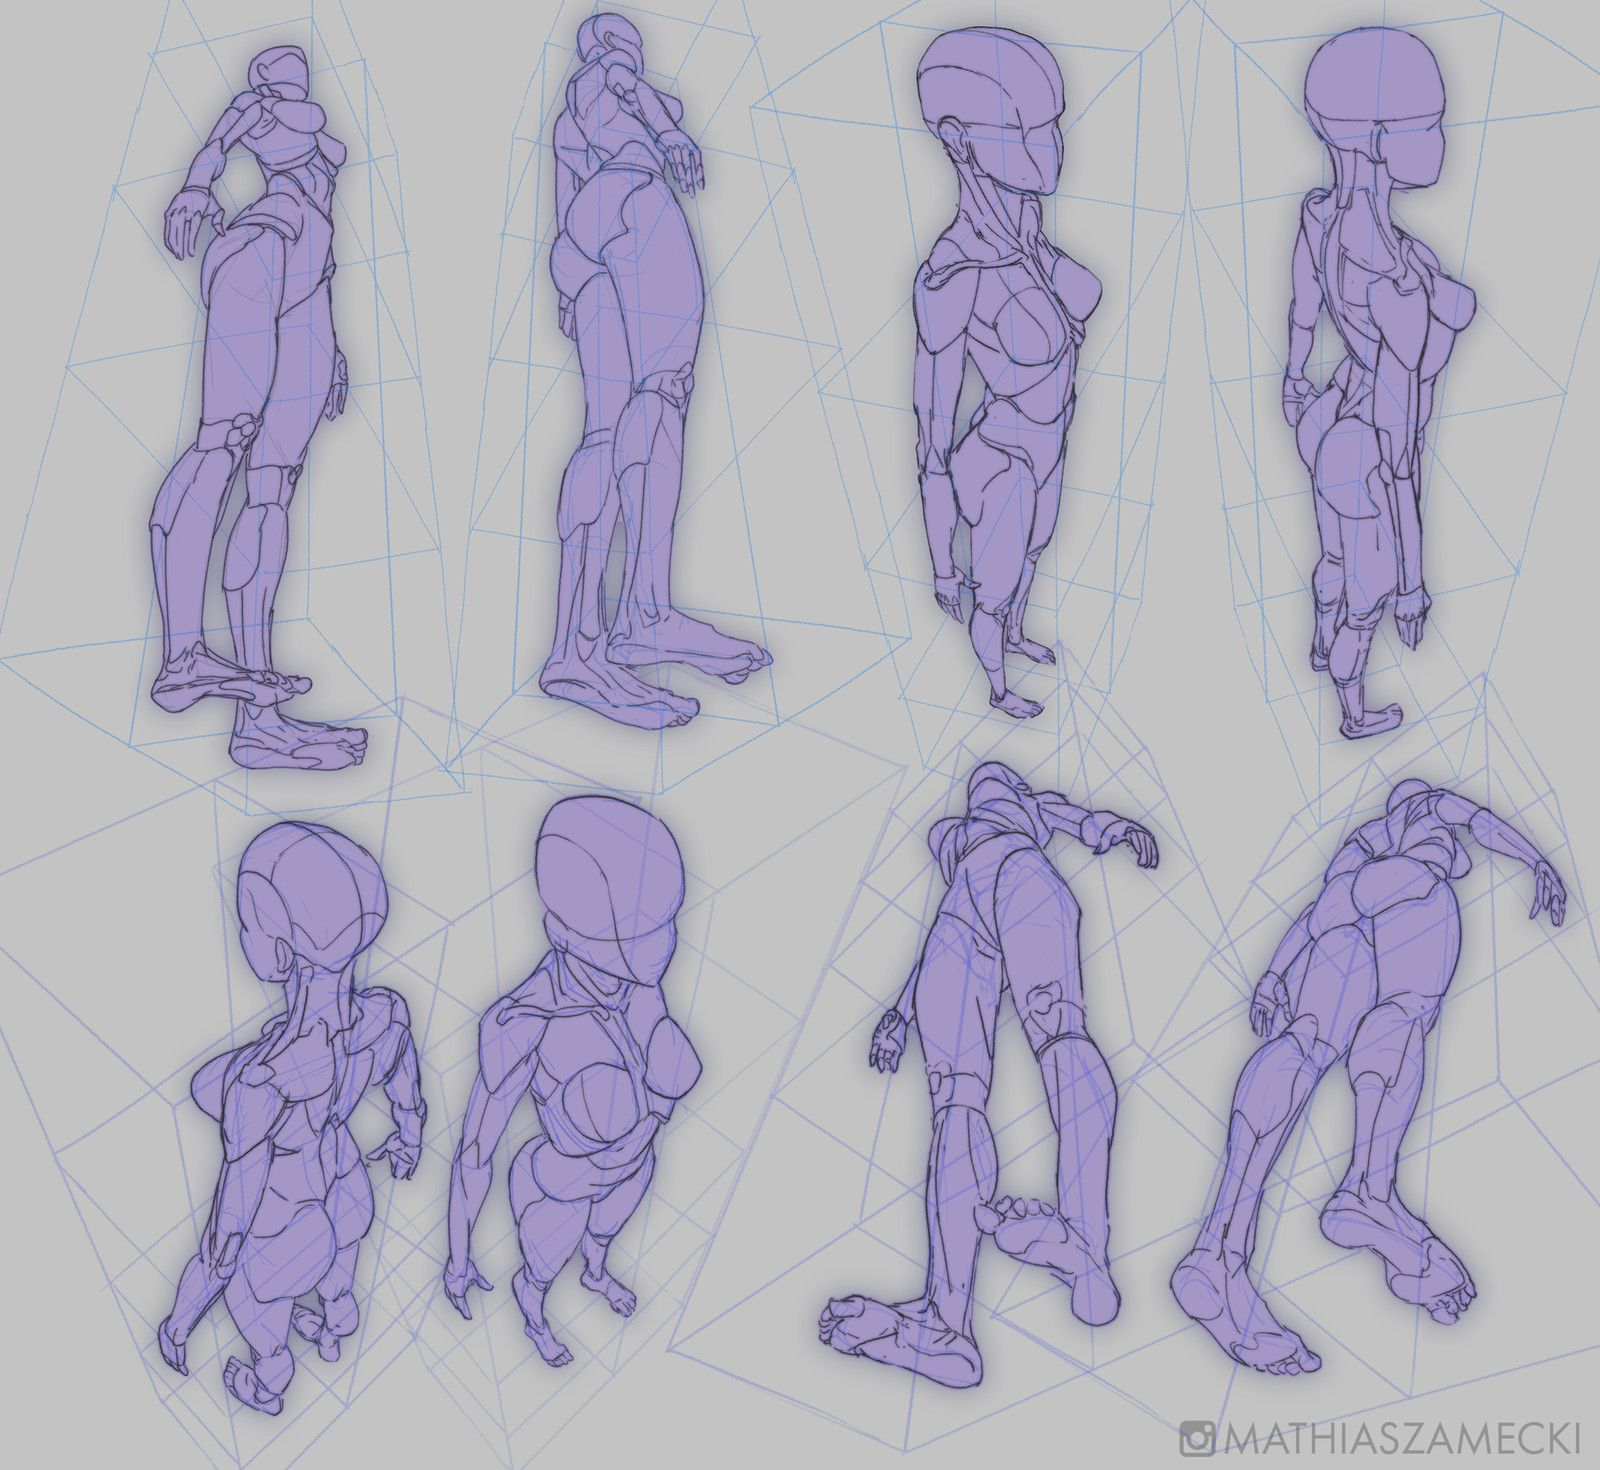 Grinding Junkyard Vol2 Mathias Zamecki On Artstation At Https Www Artstation Com Artwork Eom Figure Drawing Drawing Reference Poses Figure Drawing Reference